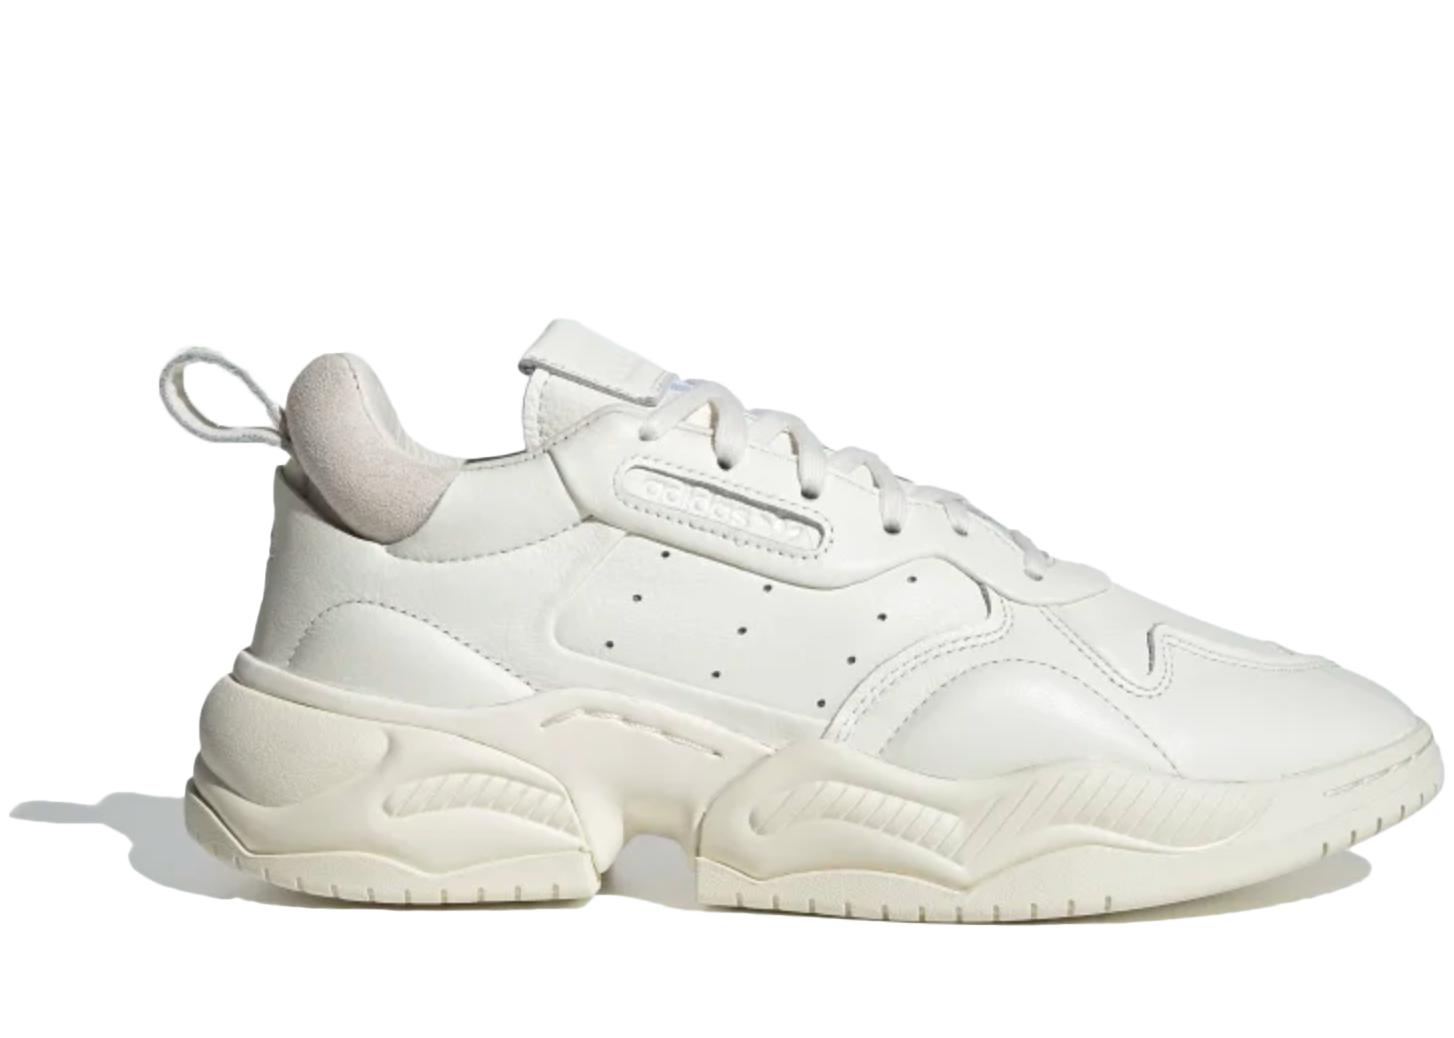 adidas Supercourt RX Off White - EG6864